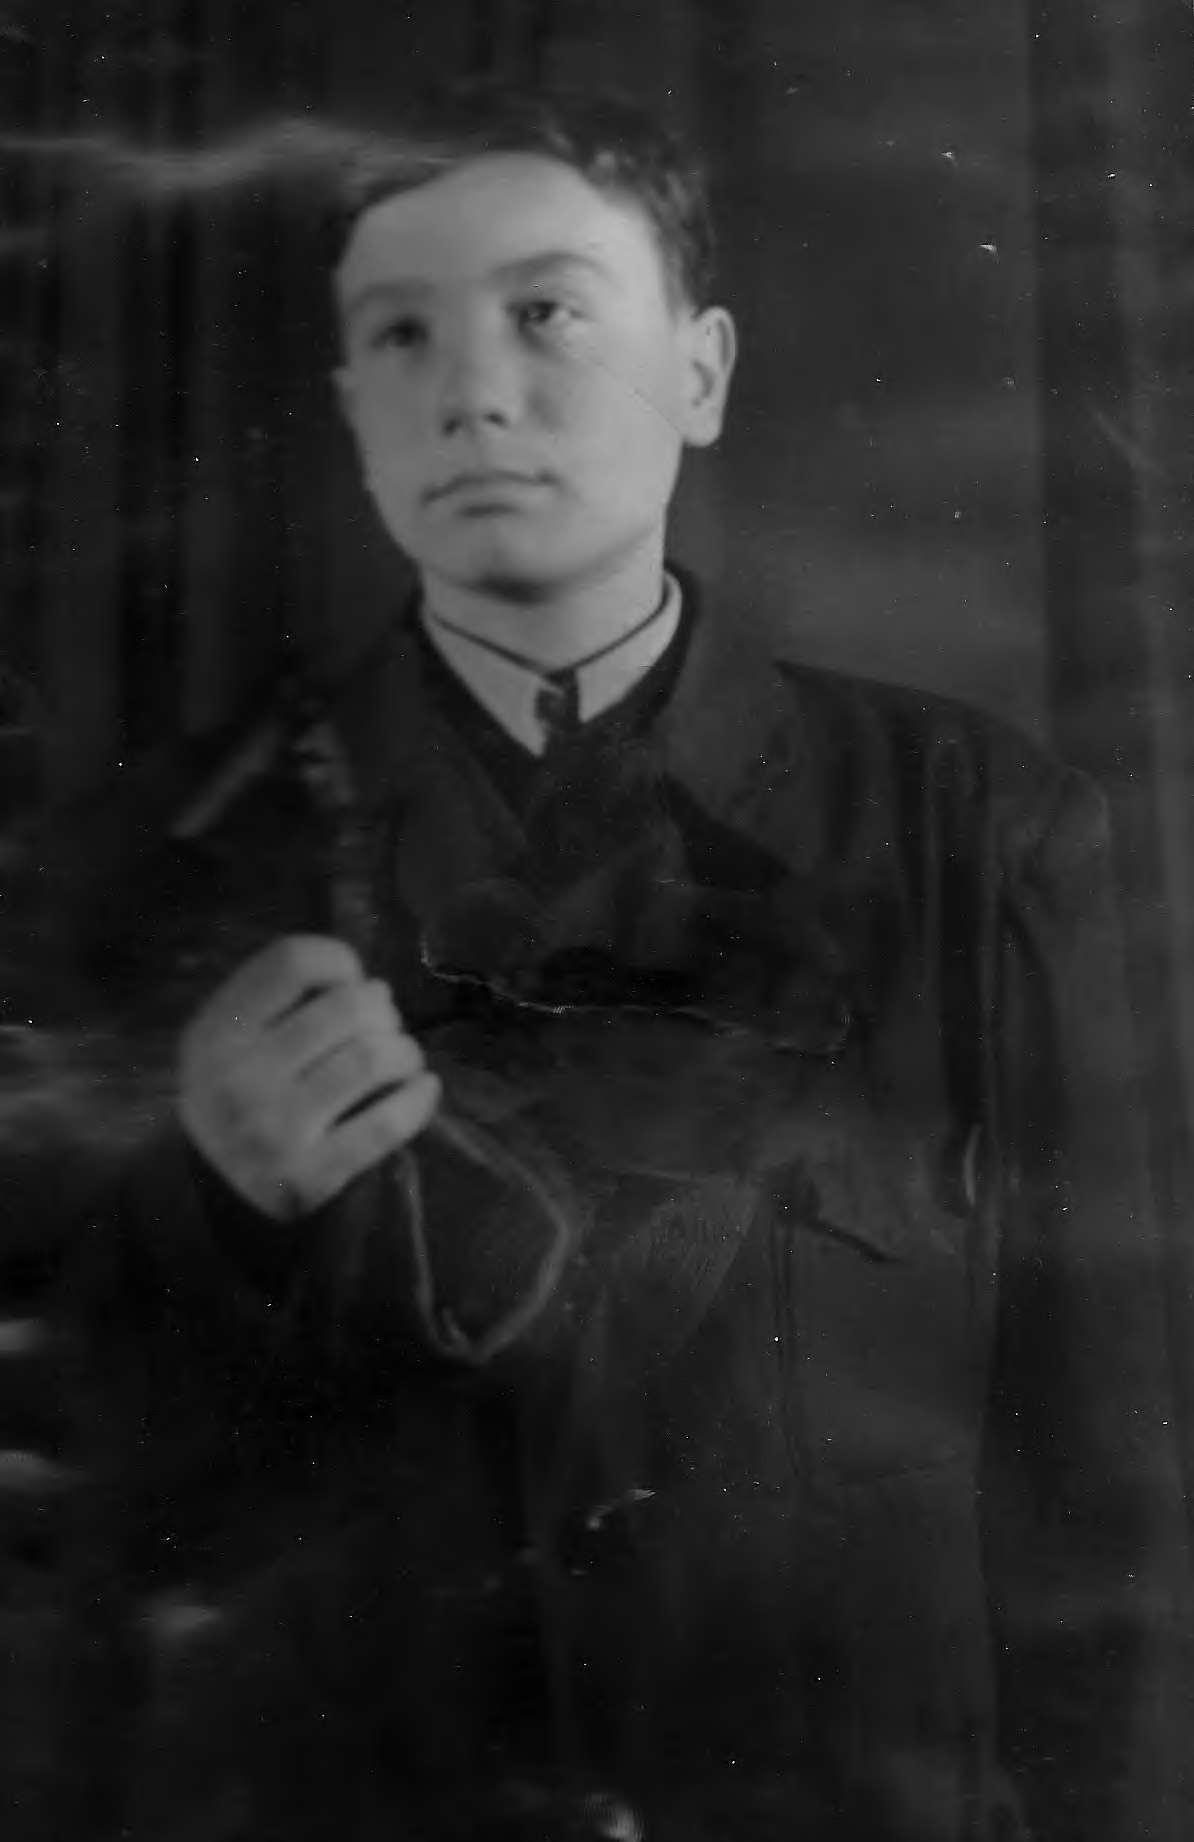 Криулин Валентин, член лит-драм кружка